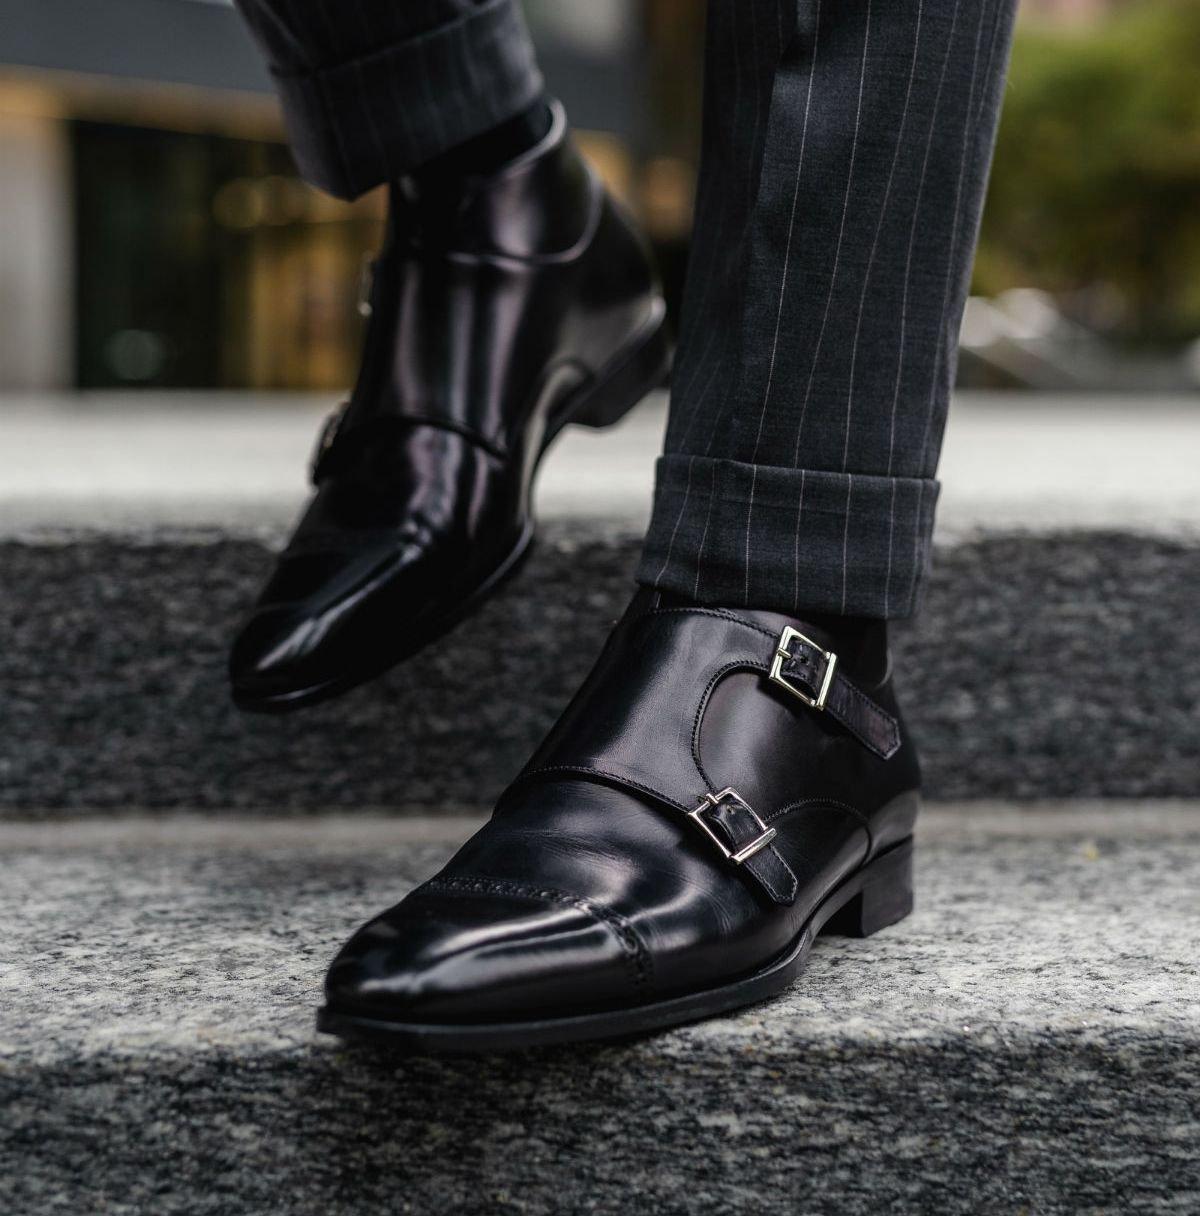 Paul Evans LLC: Elevate your wardrobe